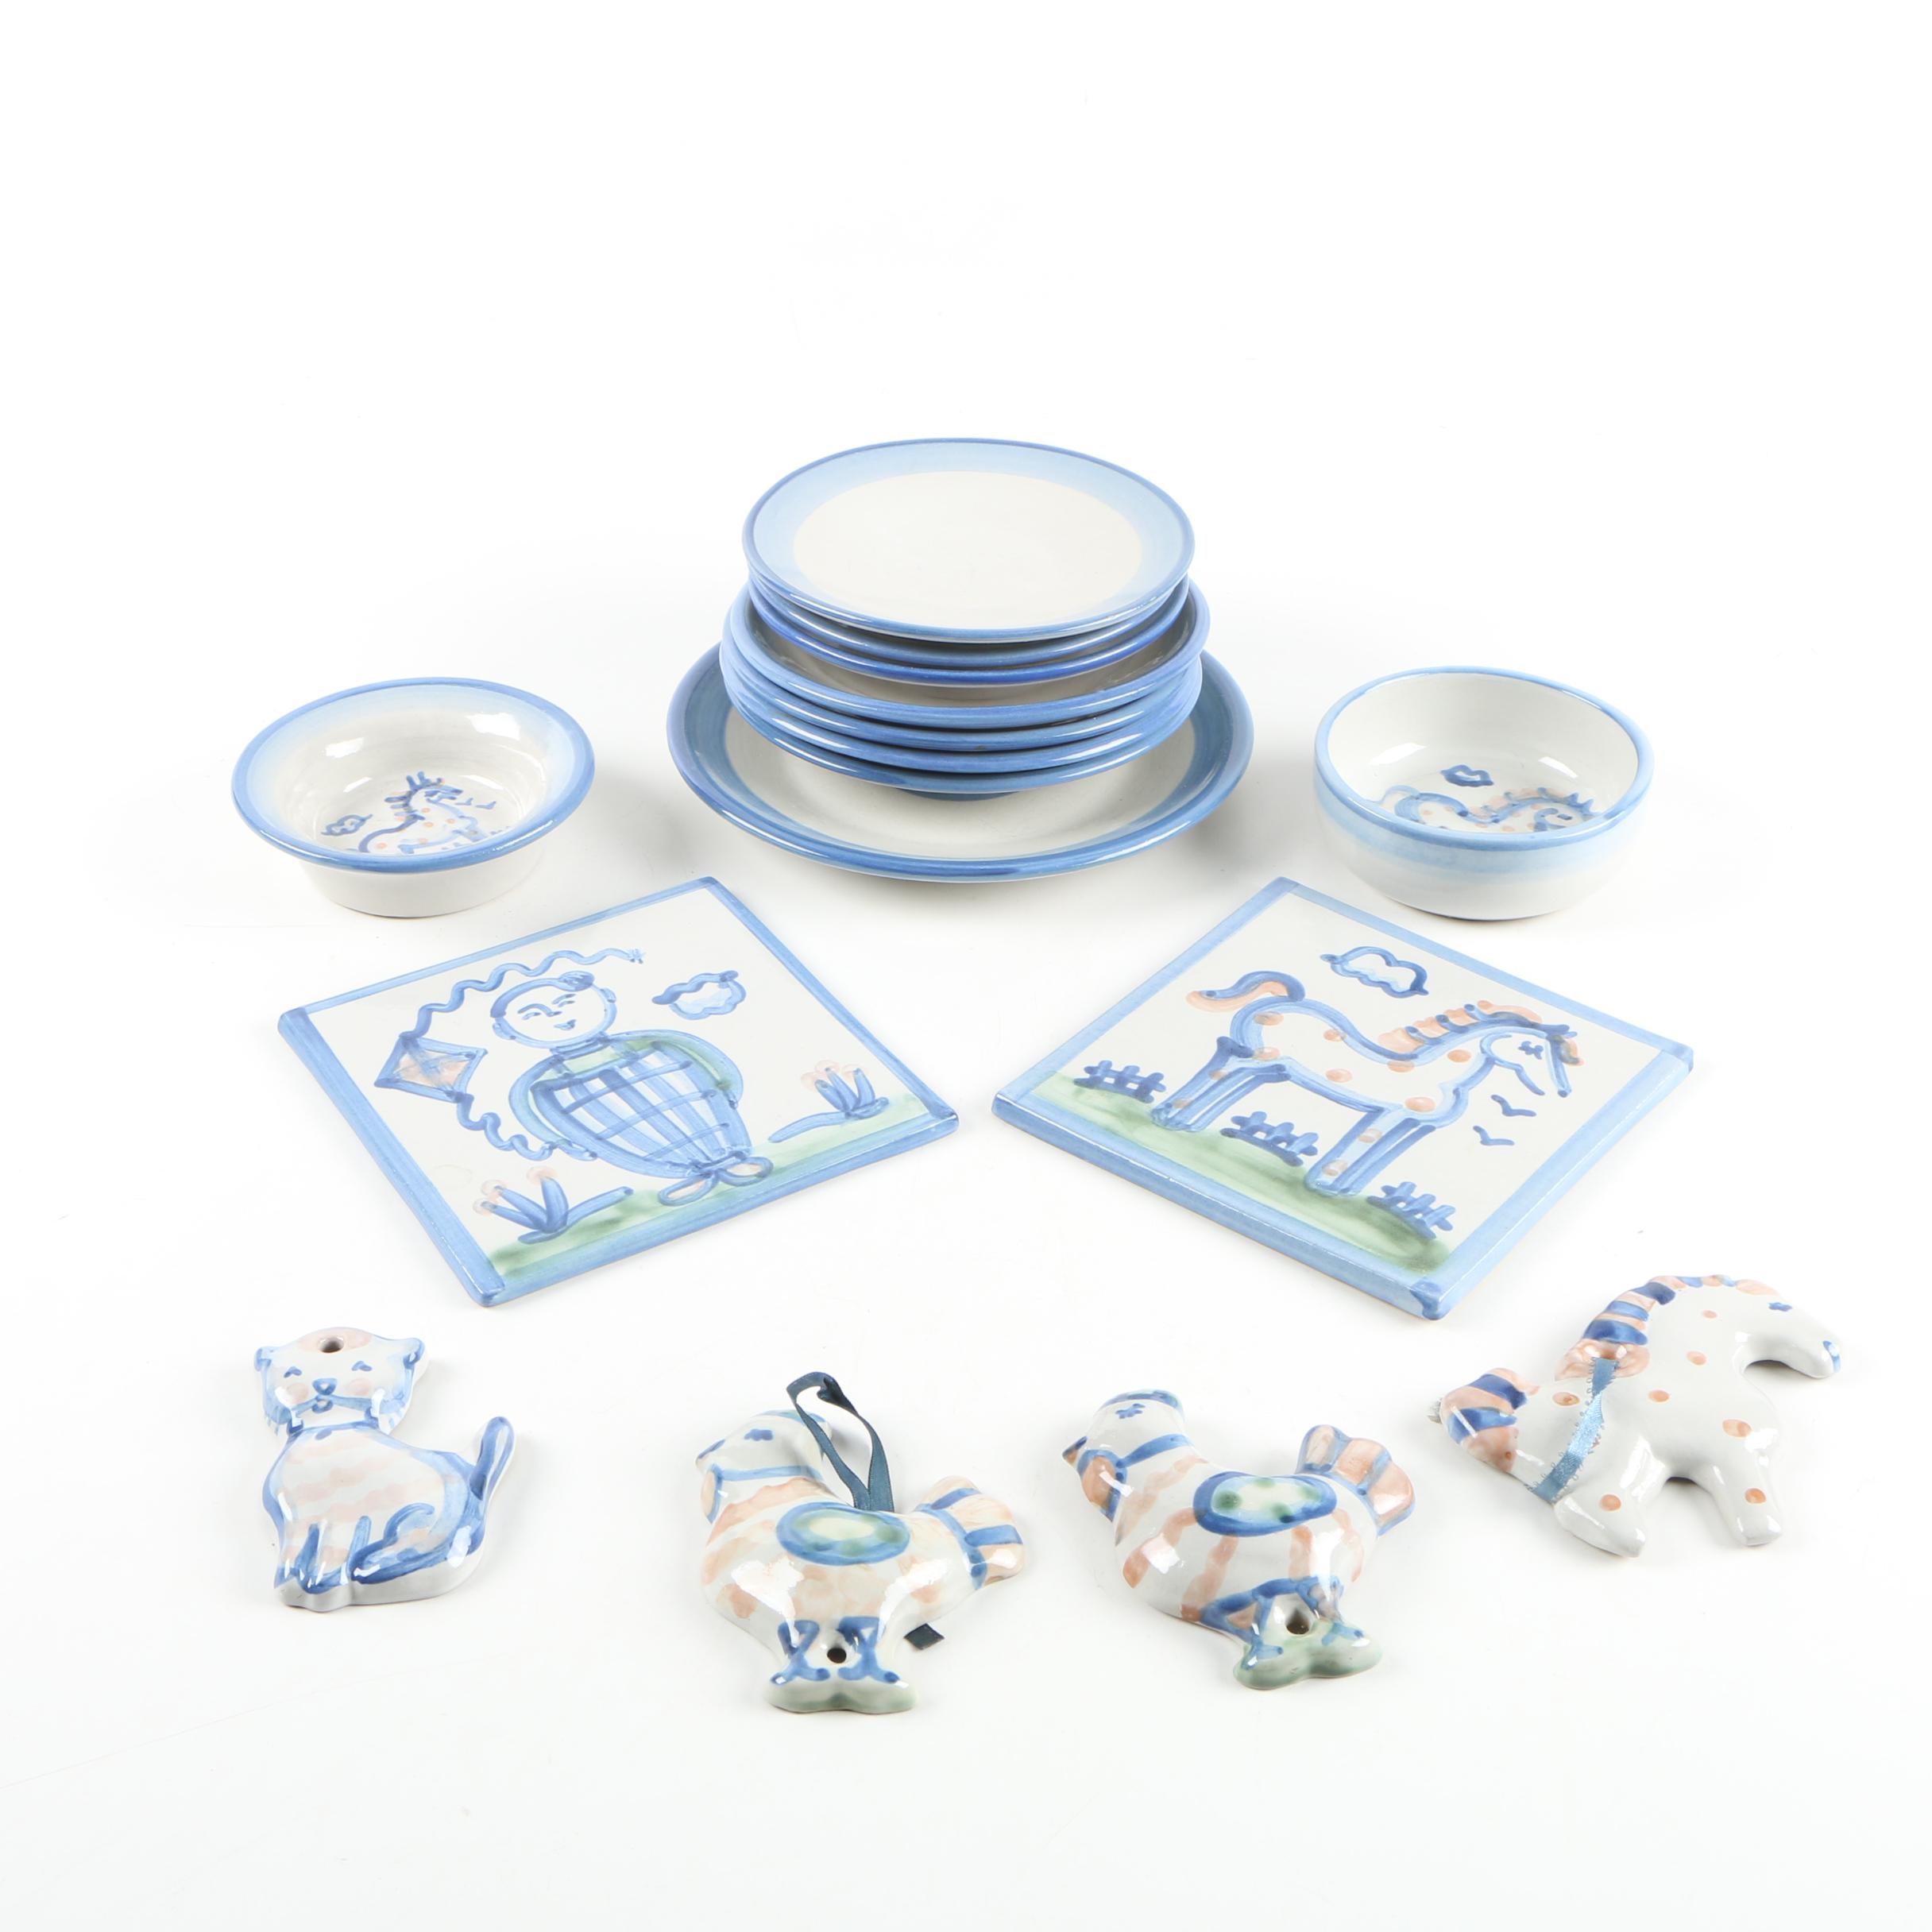 M. A. Hadley Hand Glazed Ceramic Tableware and Decor